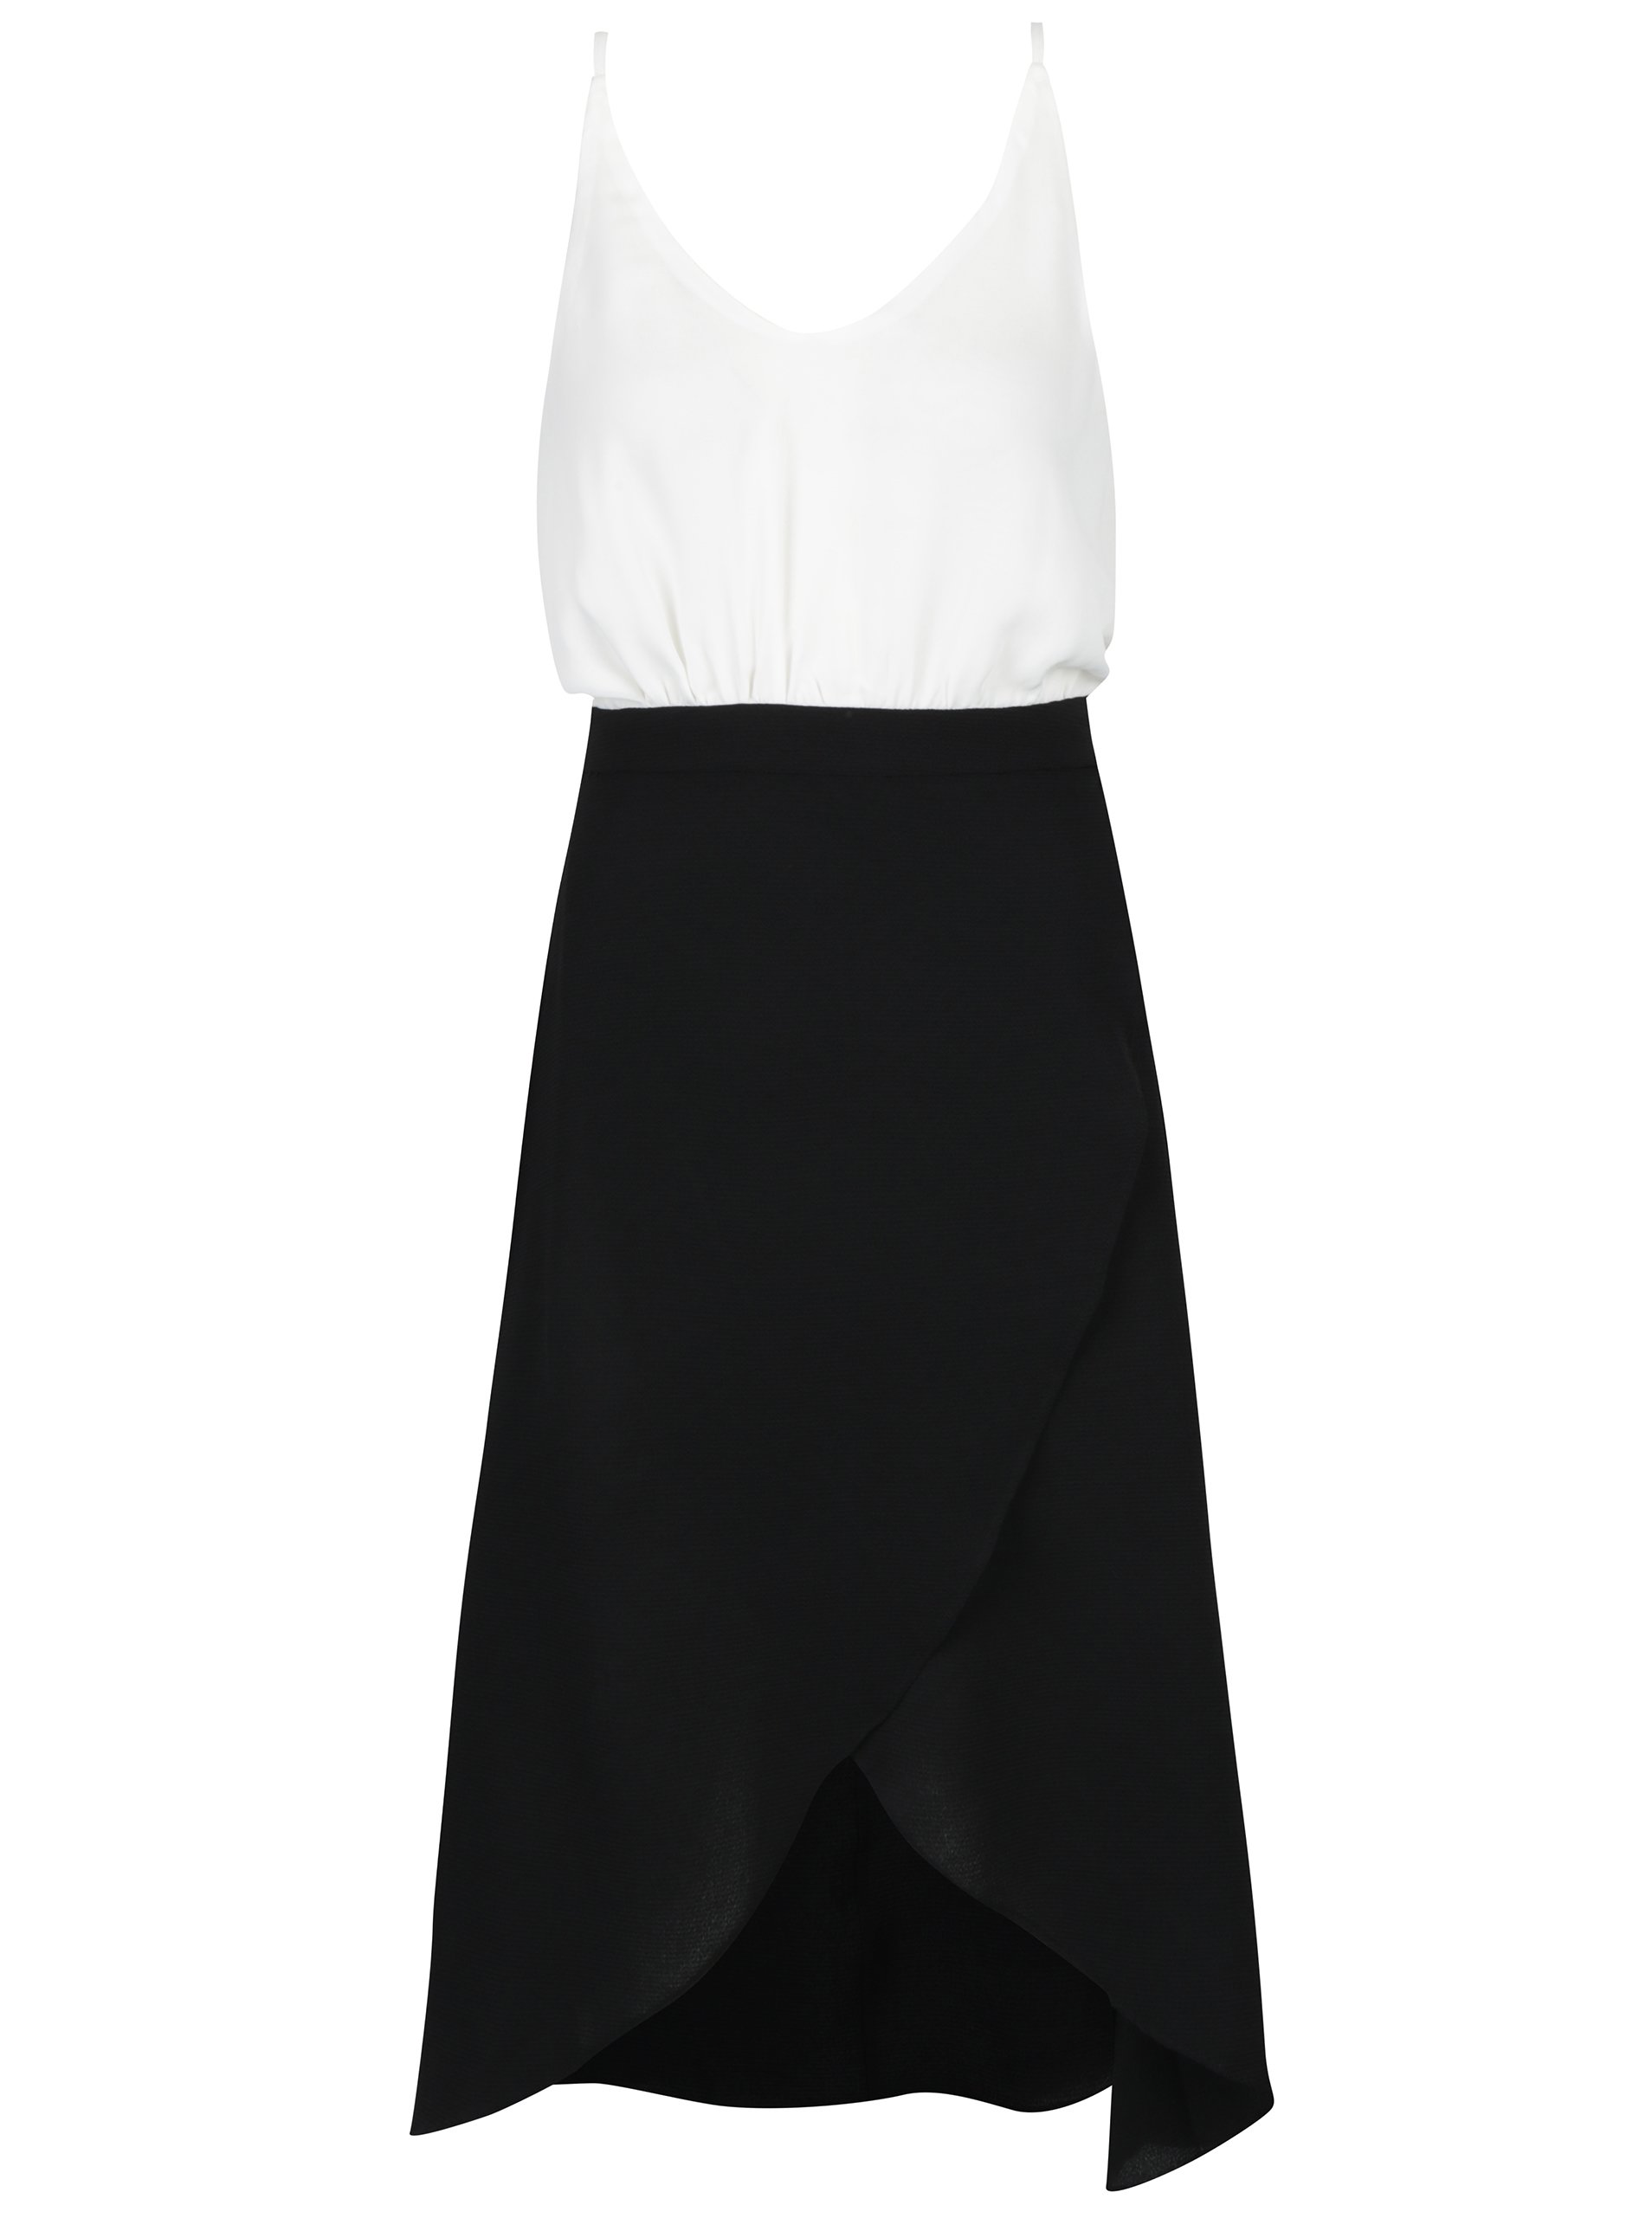 05adfa493aa4 Bielo-čierne šaty s prekladanou sukňou a opaskom AX Paris